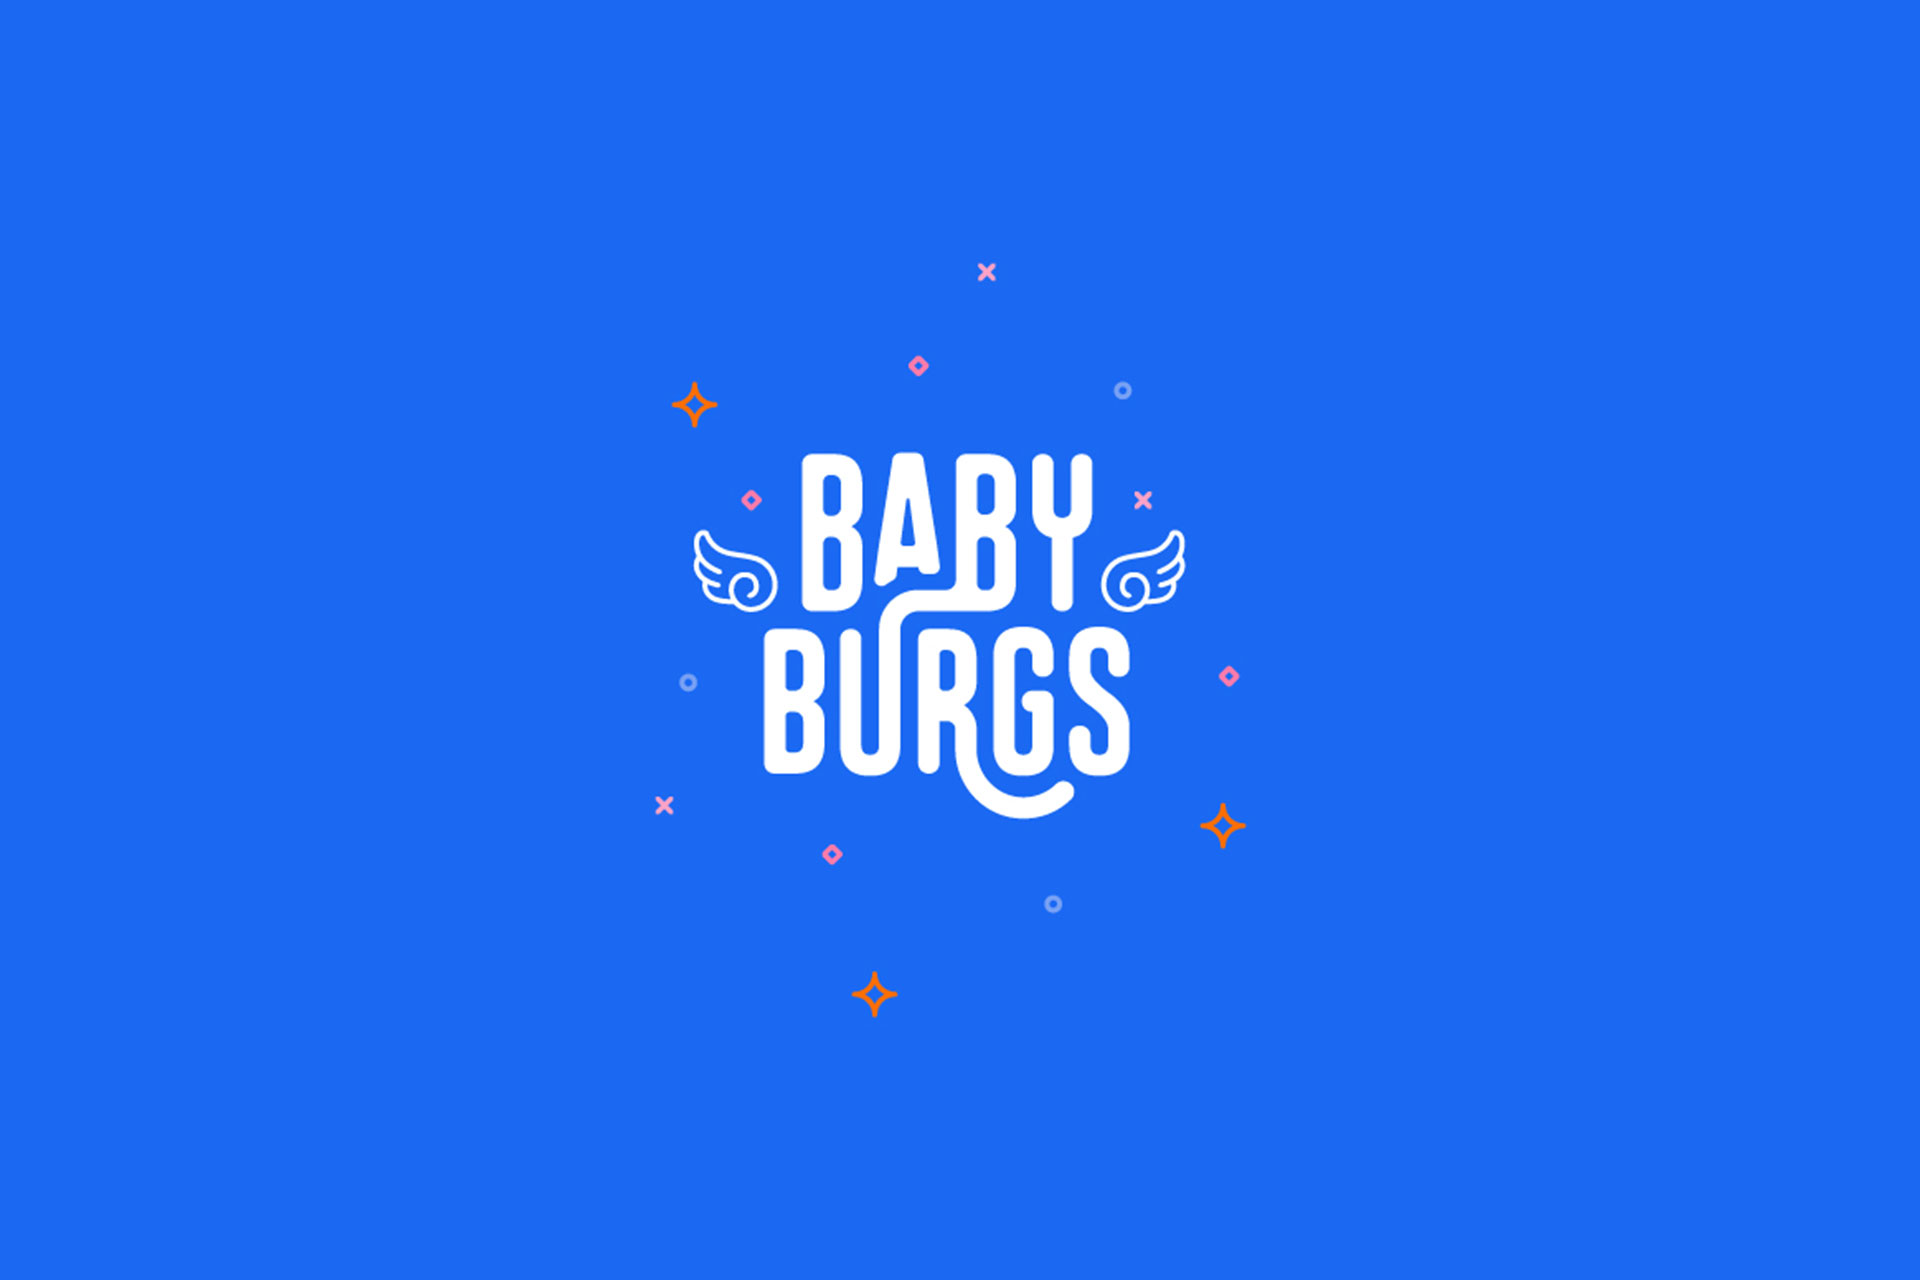 Babyburgs restaurant branding by Z Creative Studio Branding & Graphic Design Melbourne